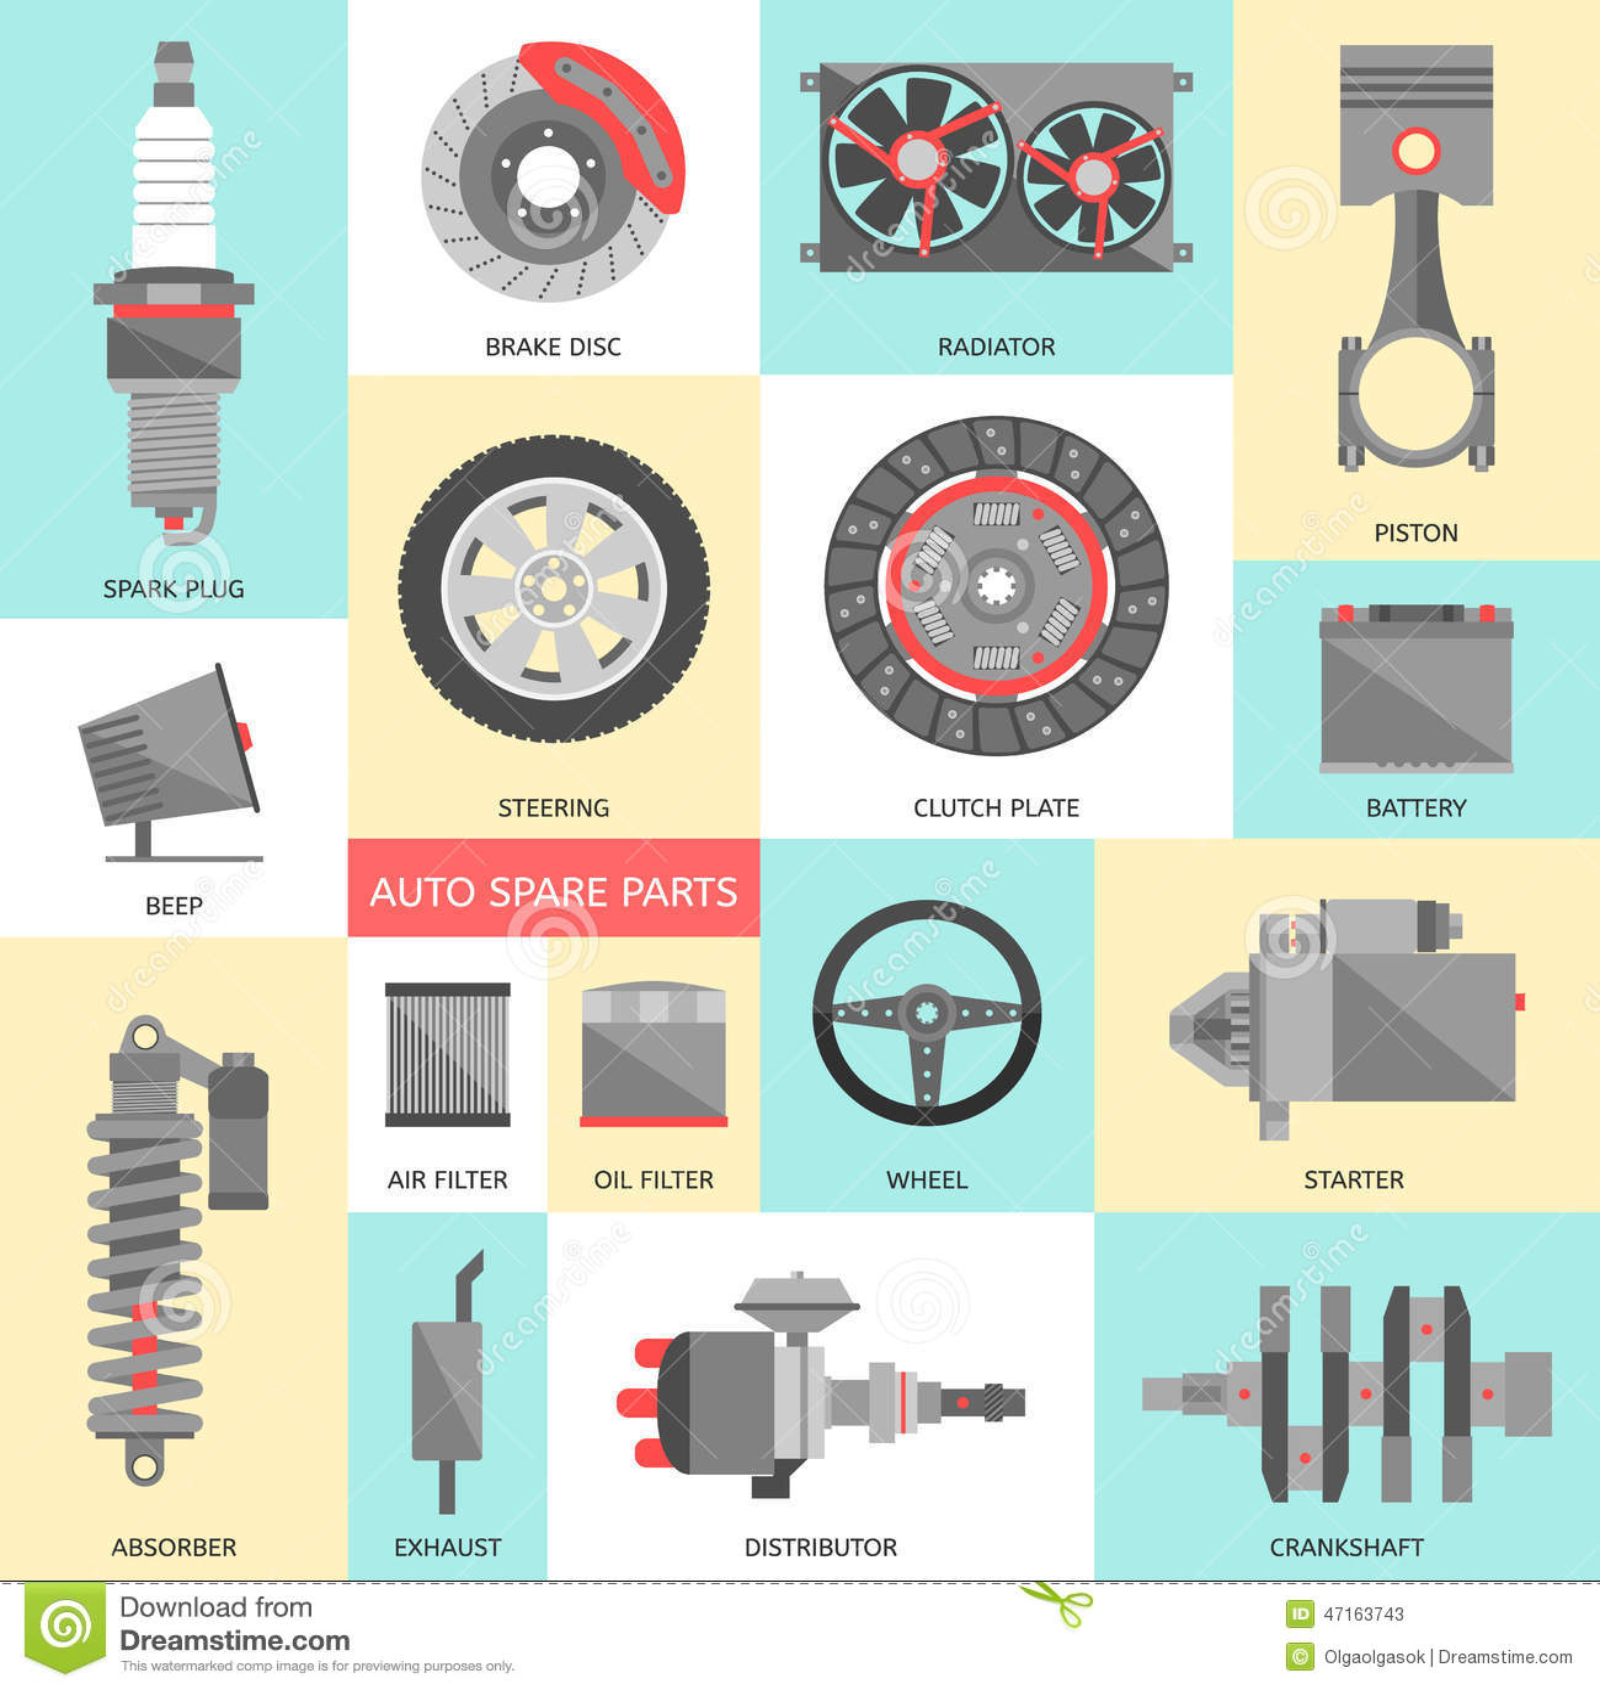 Auto Repair Parts : Set of auto spare parts car repair icons in flat style